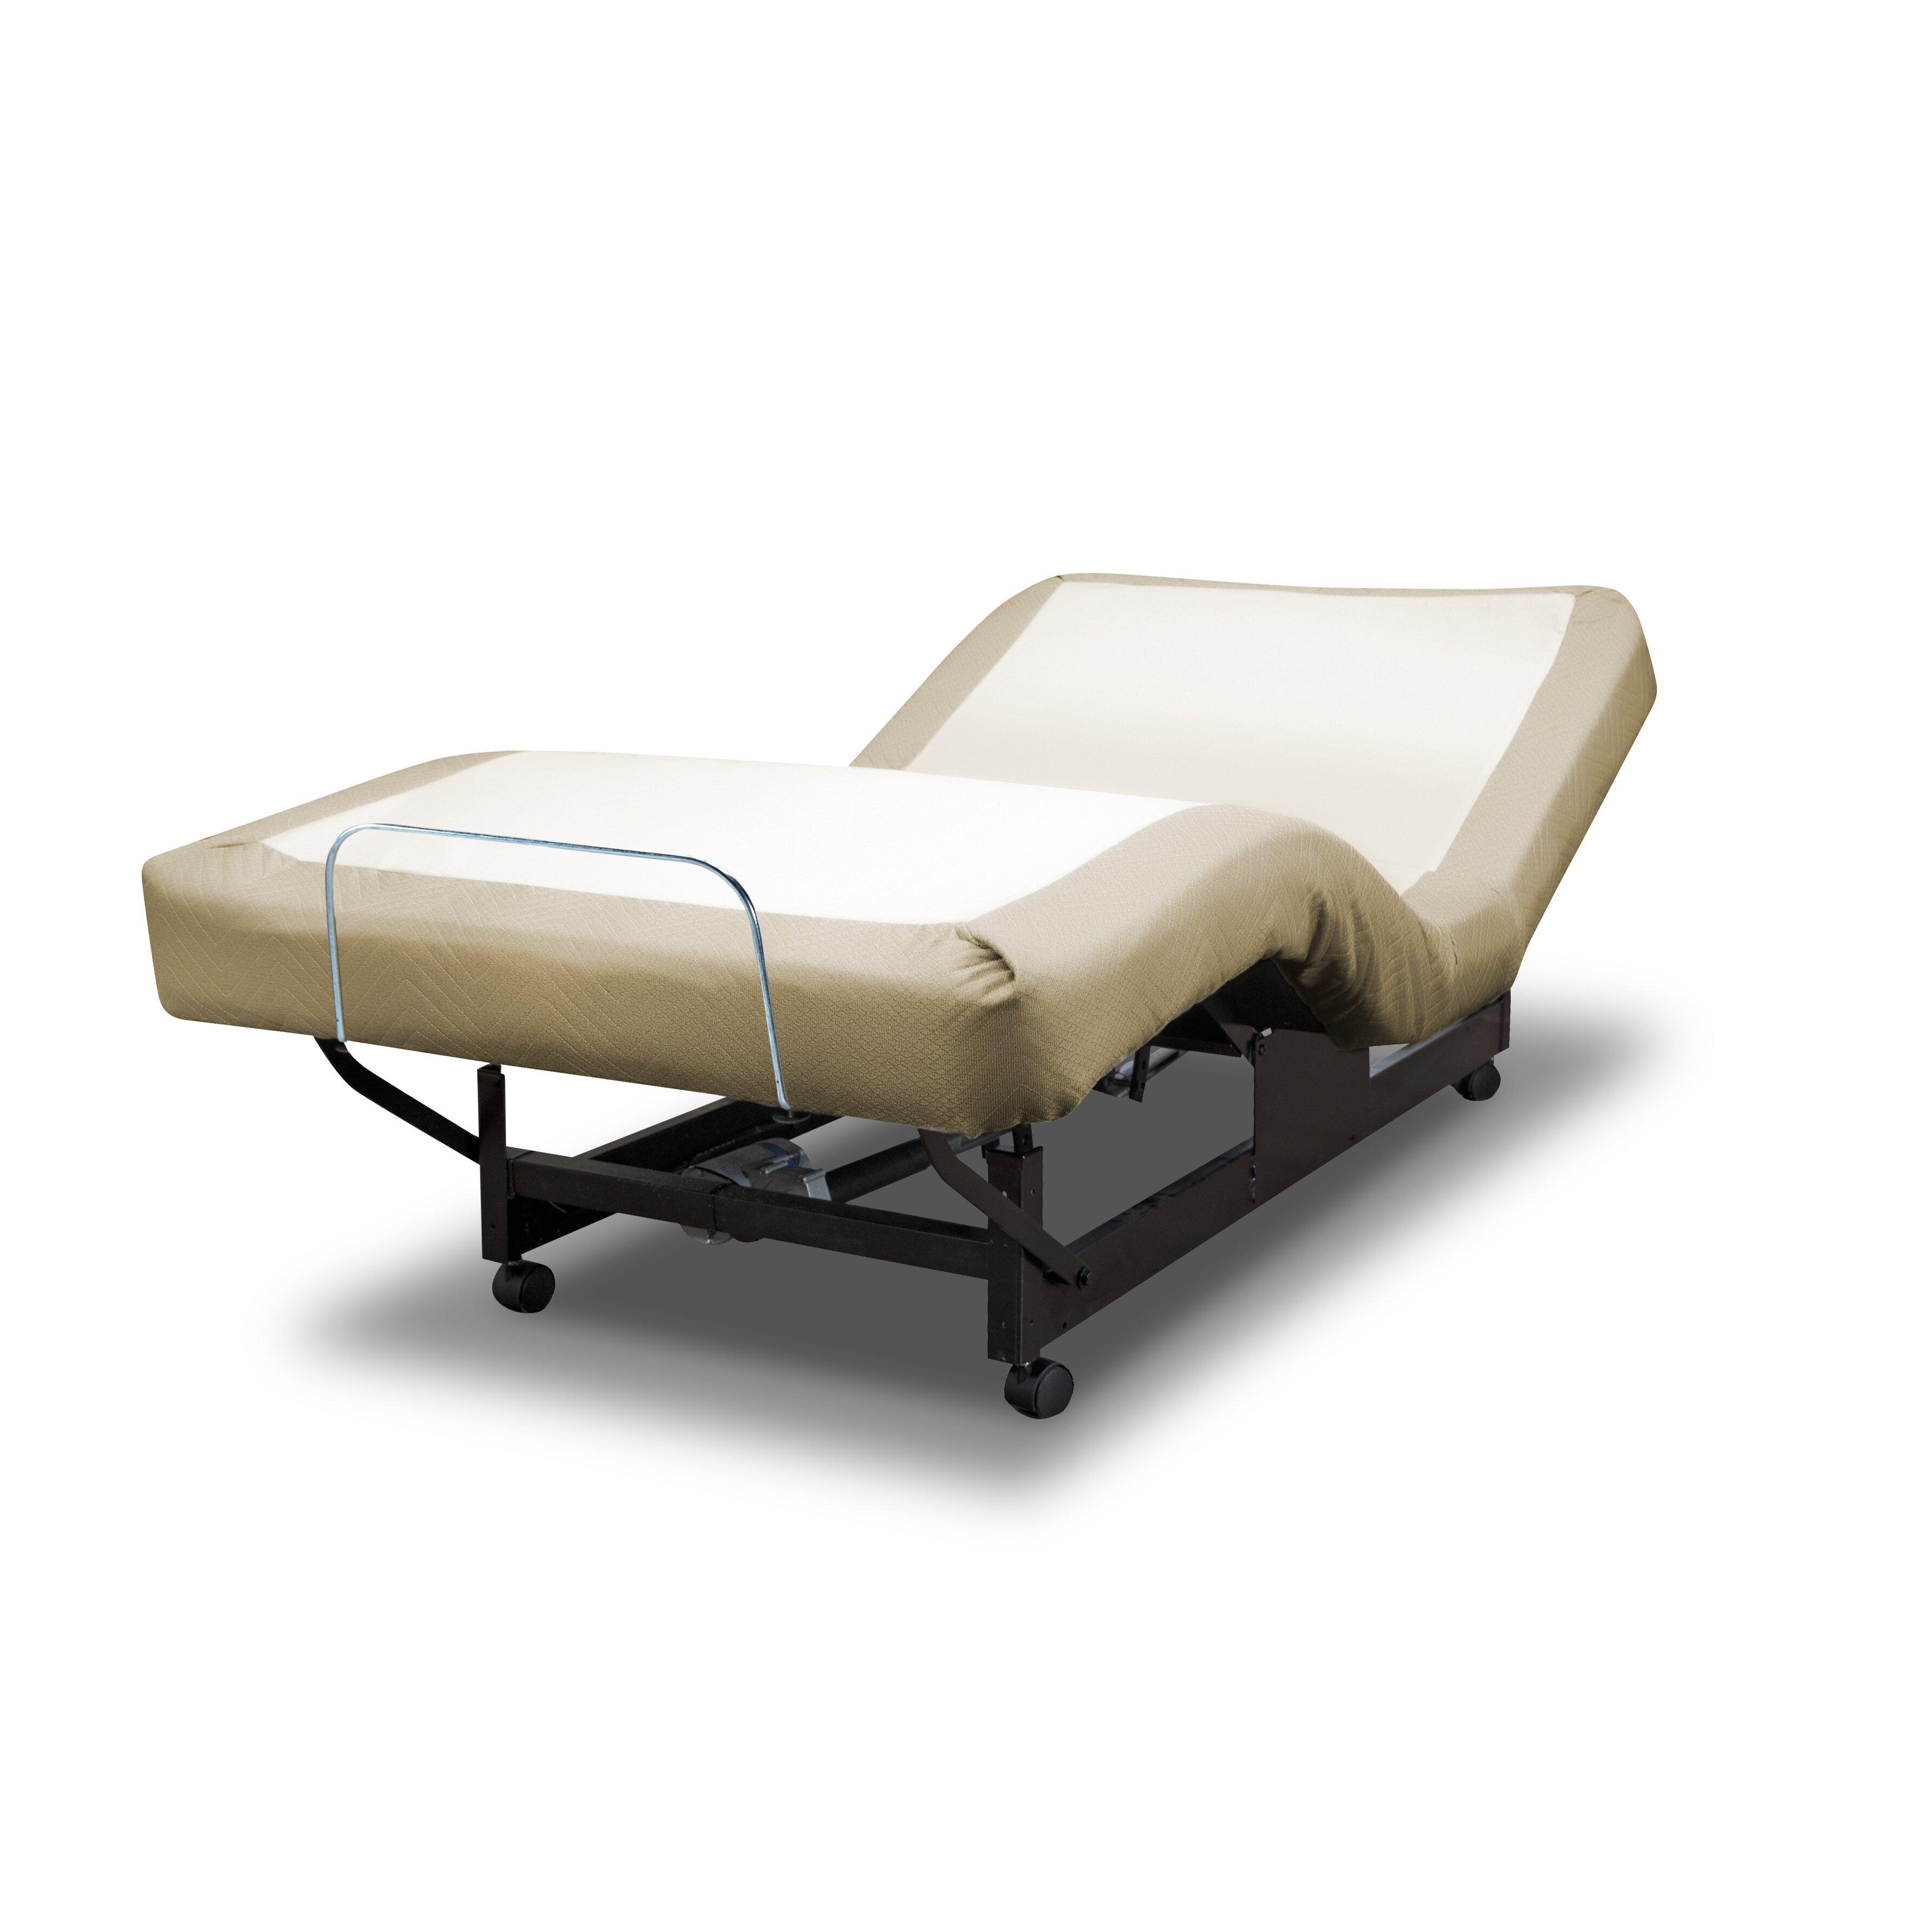 Med-Lift Economy Series Adjustable Bed & Reviews | Wayfair.ca